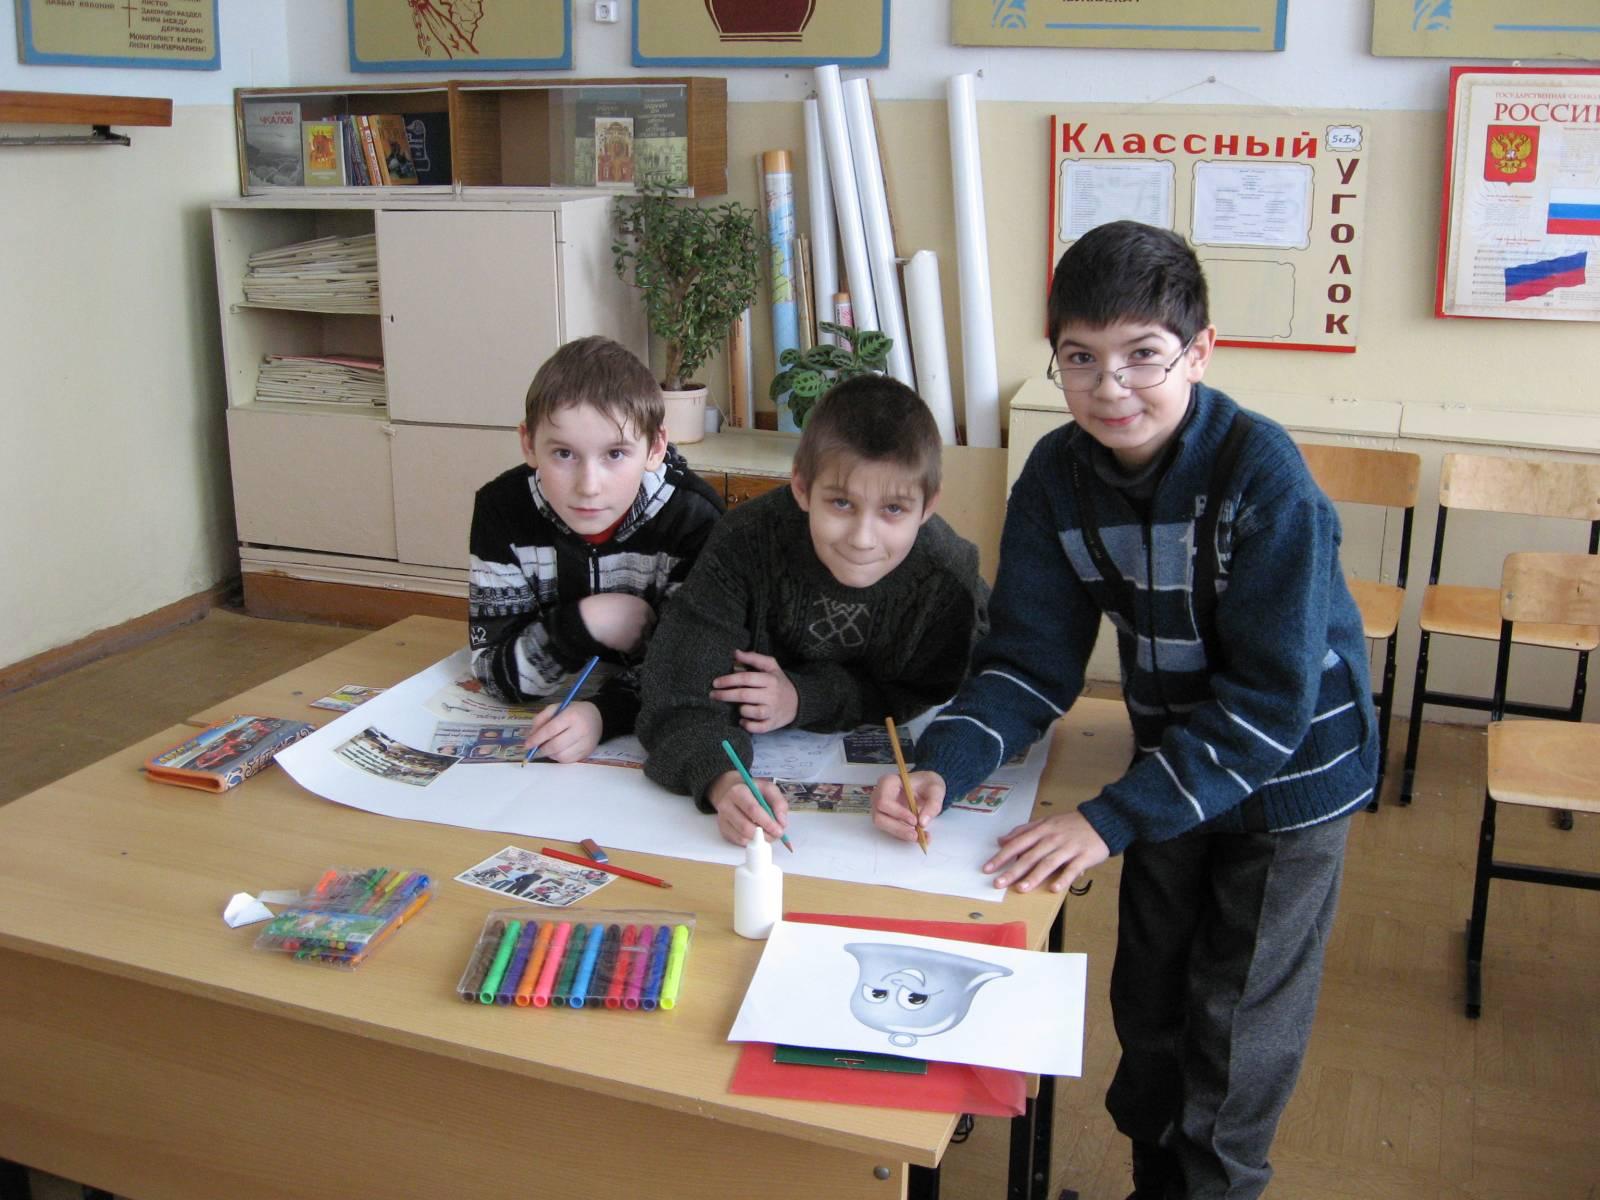 Дети рисующие стенгазету